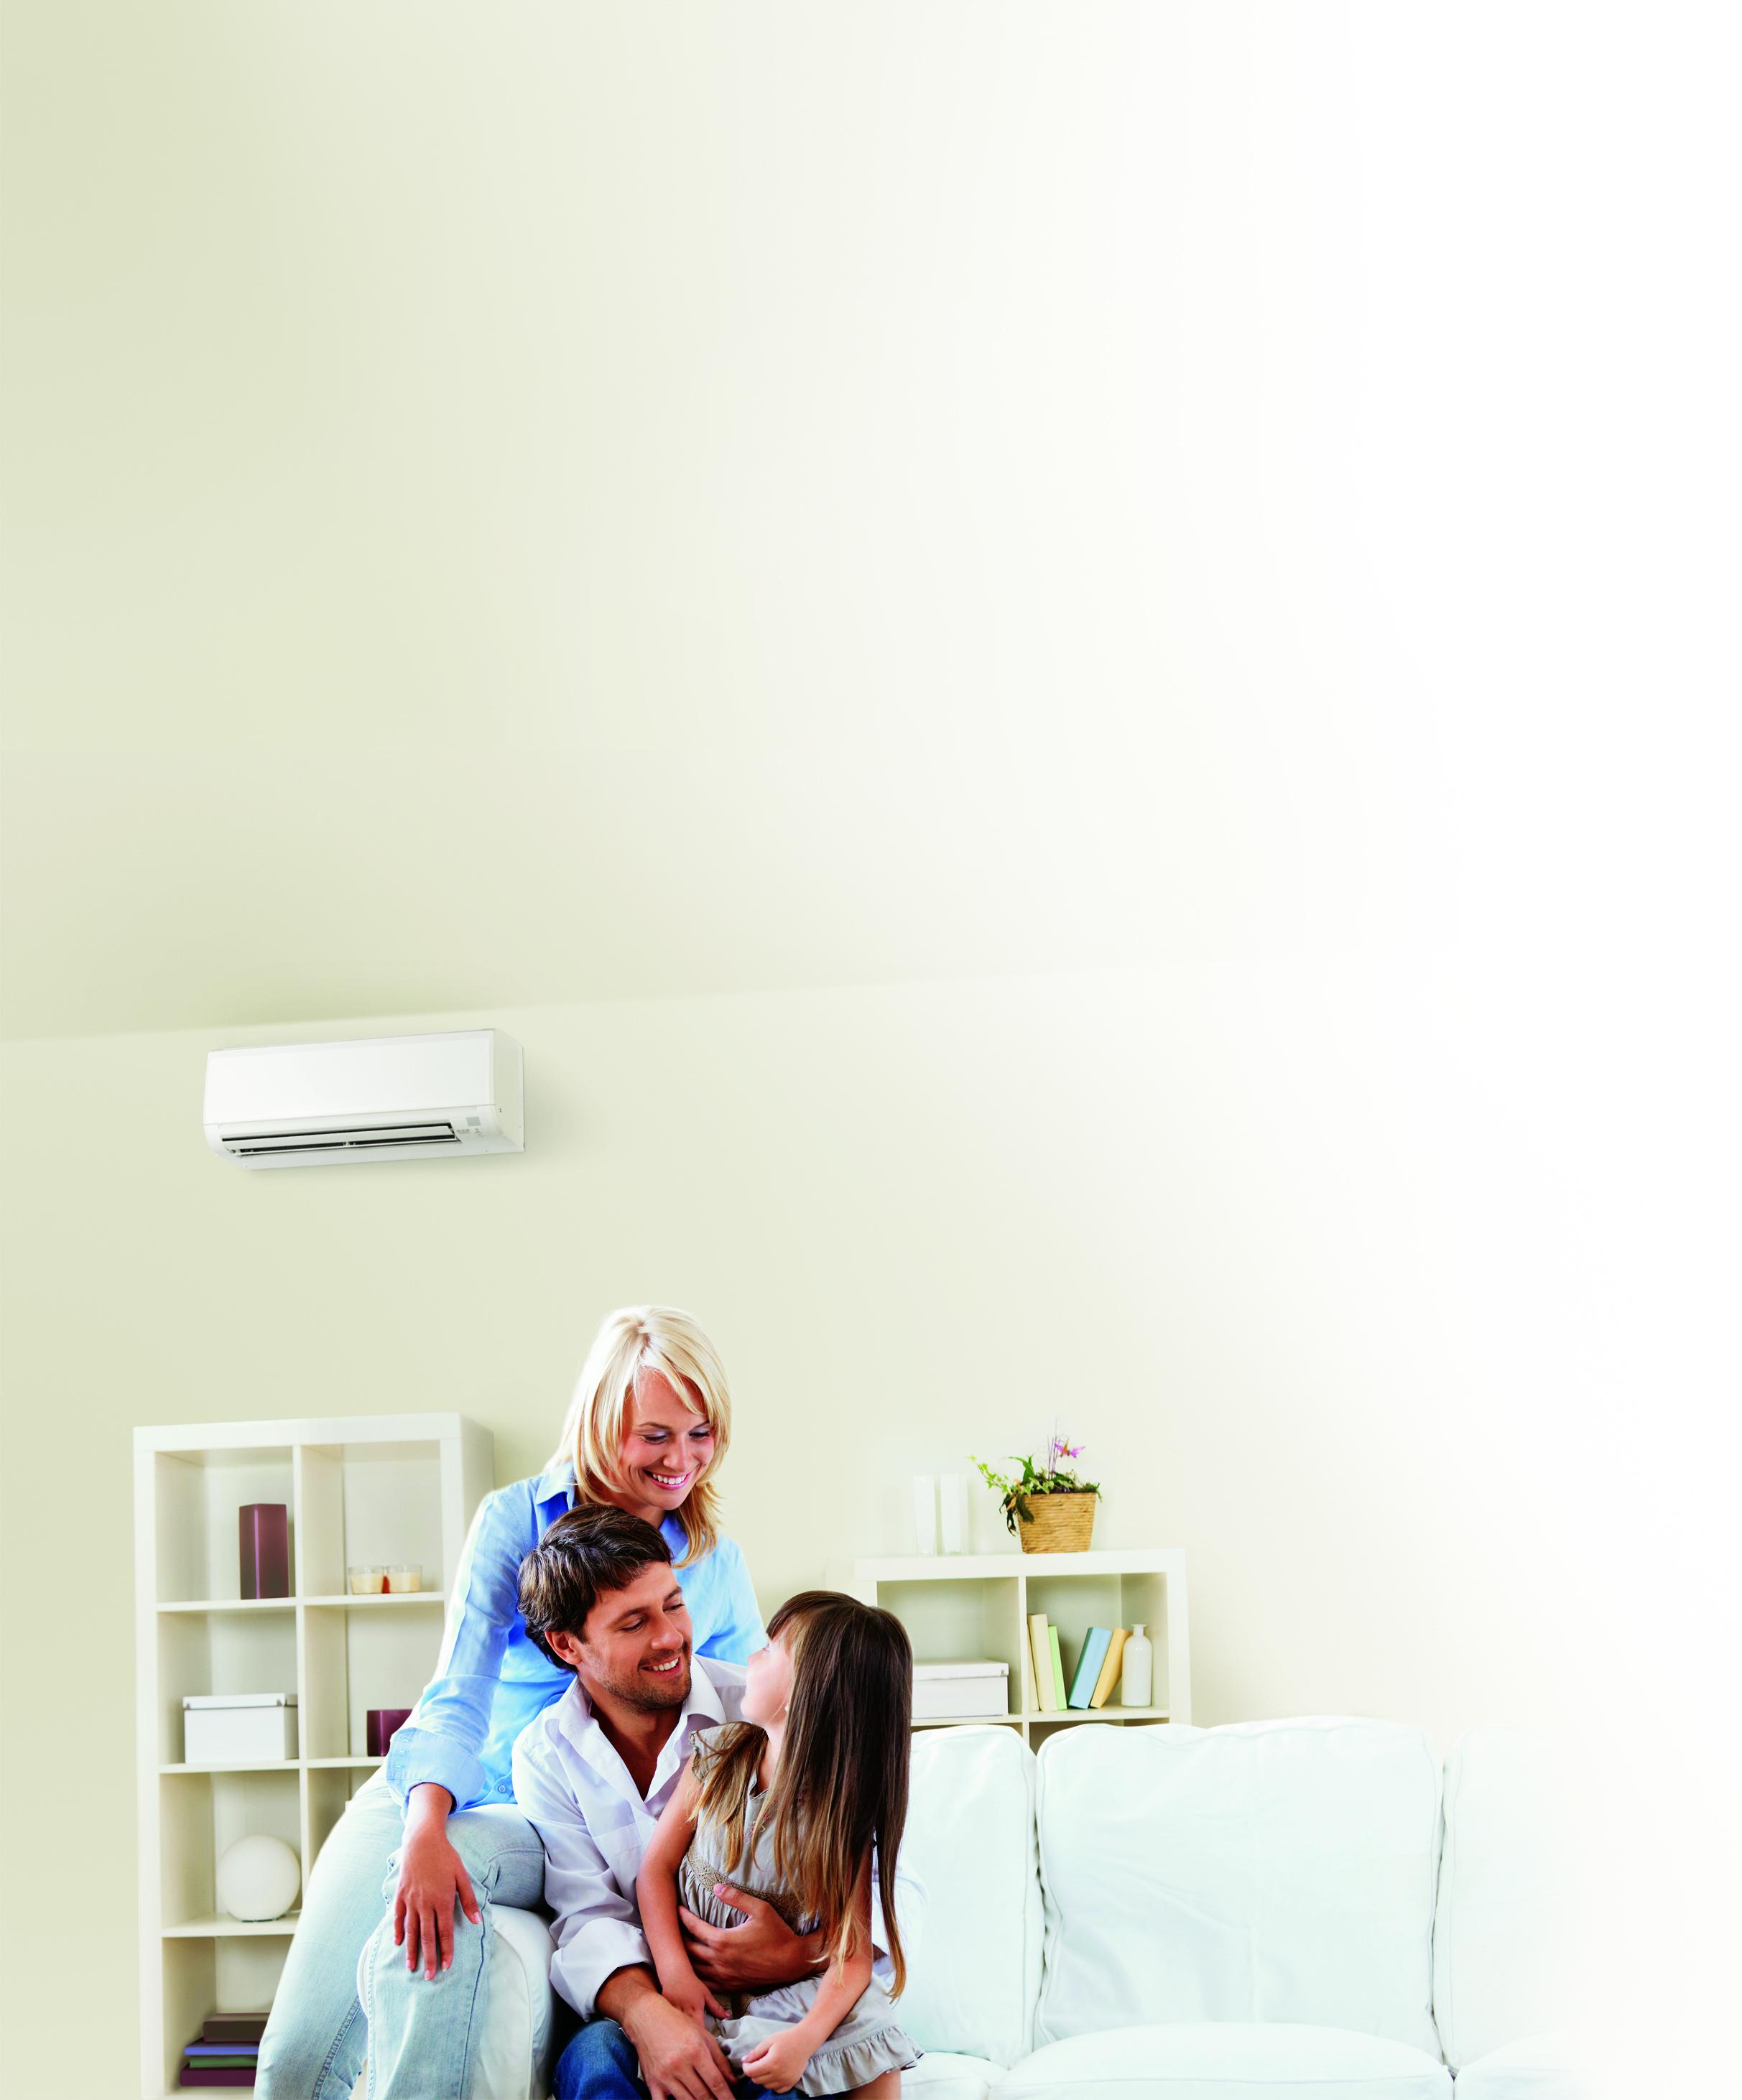 wireless thermostat